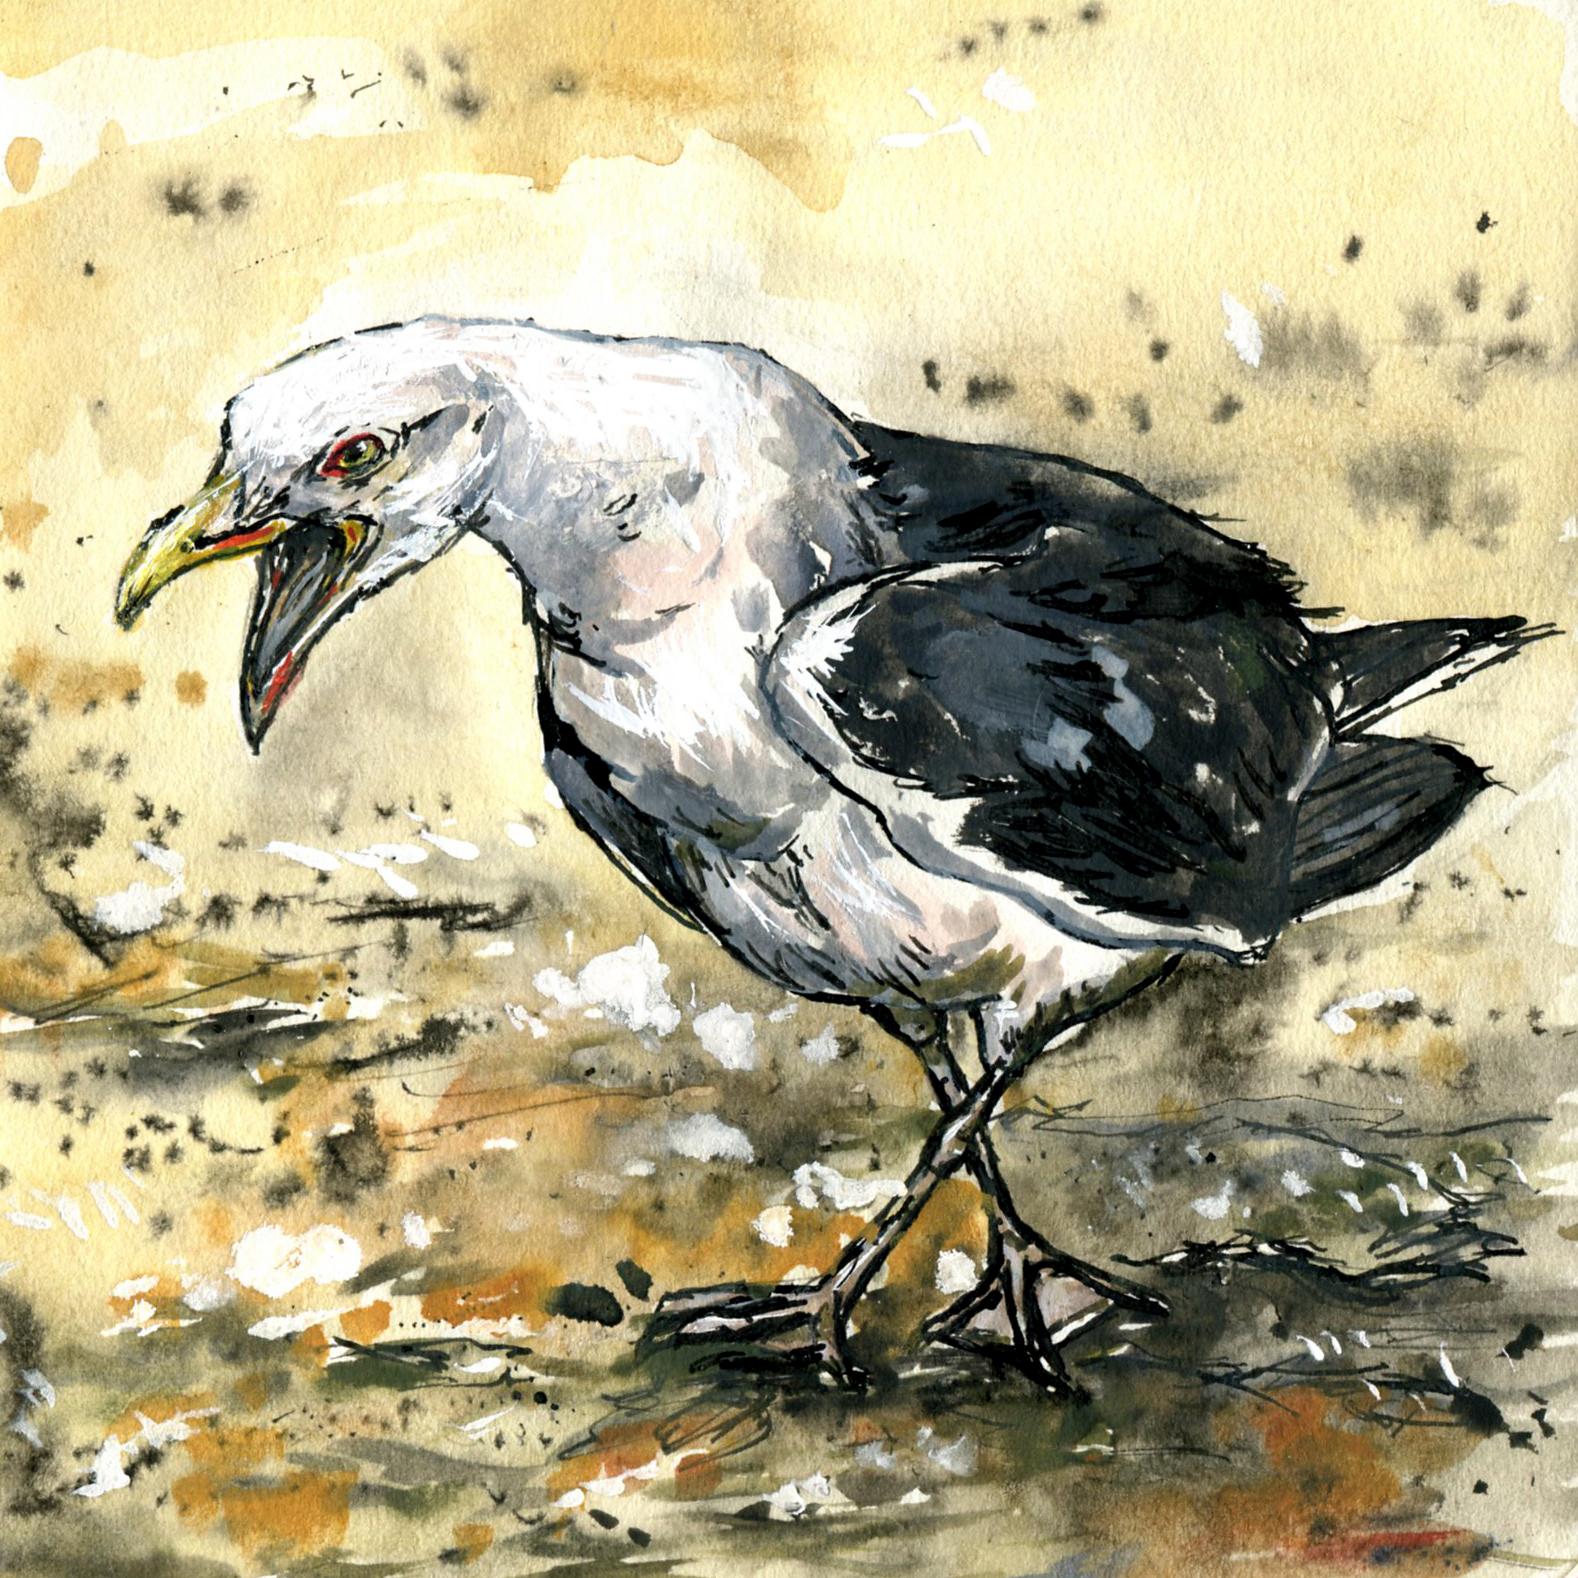 70. Great Black-backed Gull